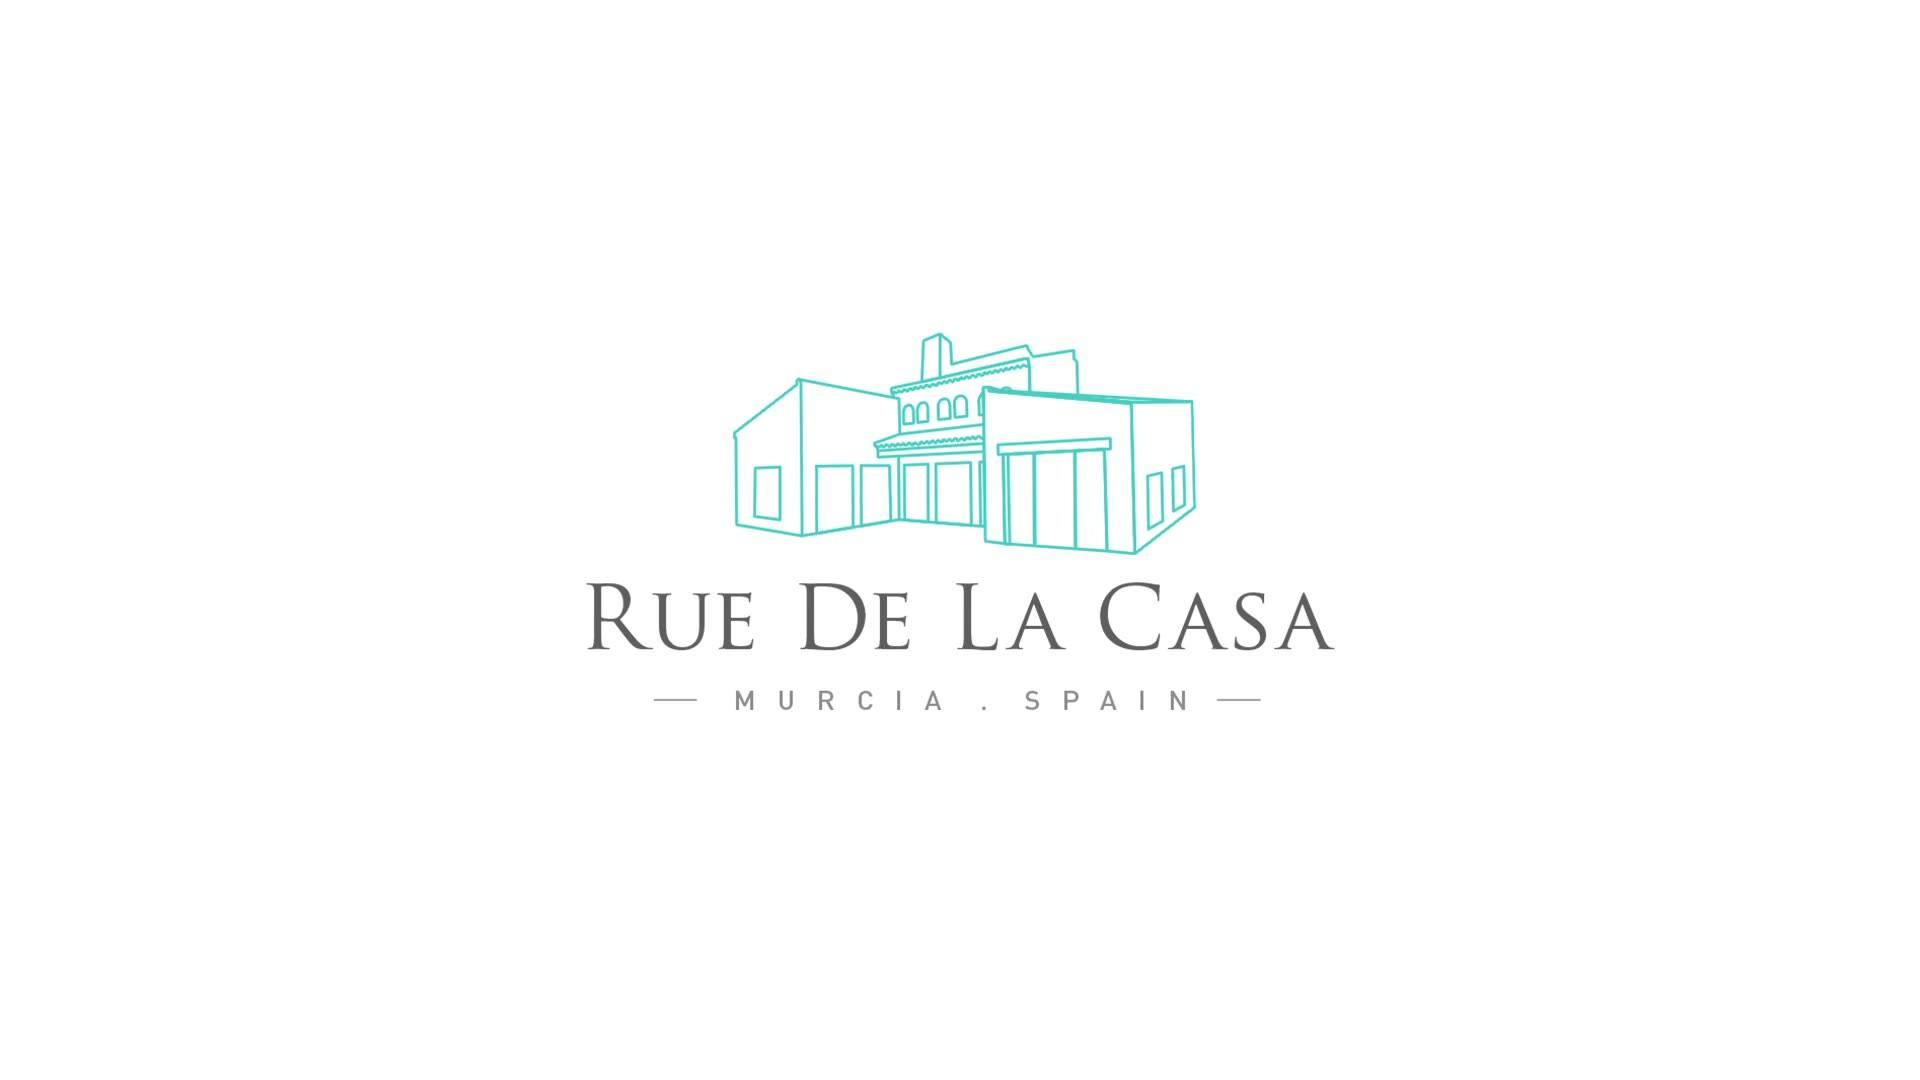 RUE DE LA CASA (Promotional Video)